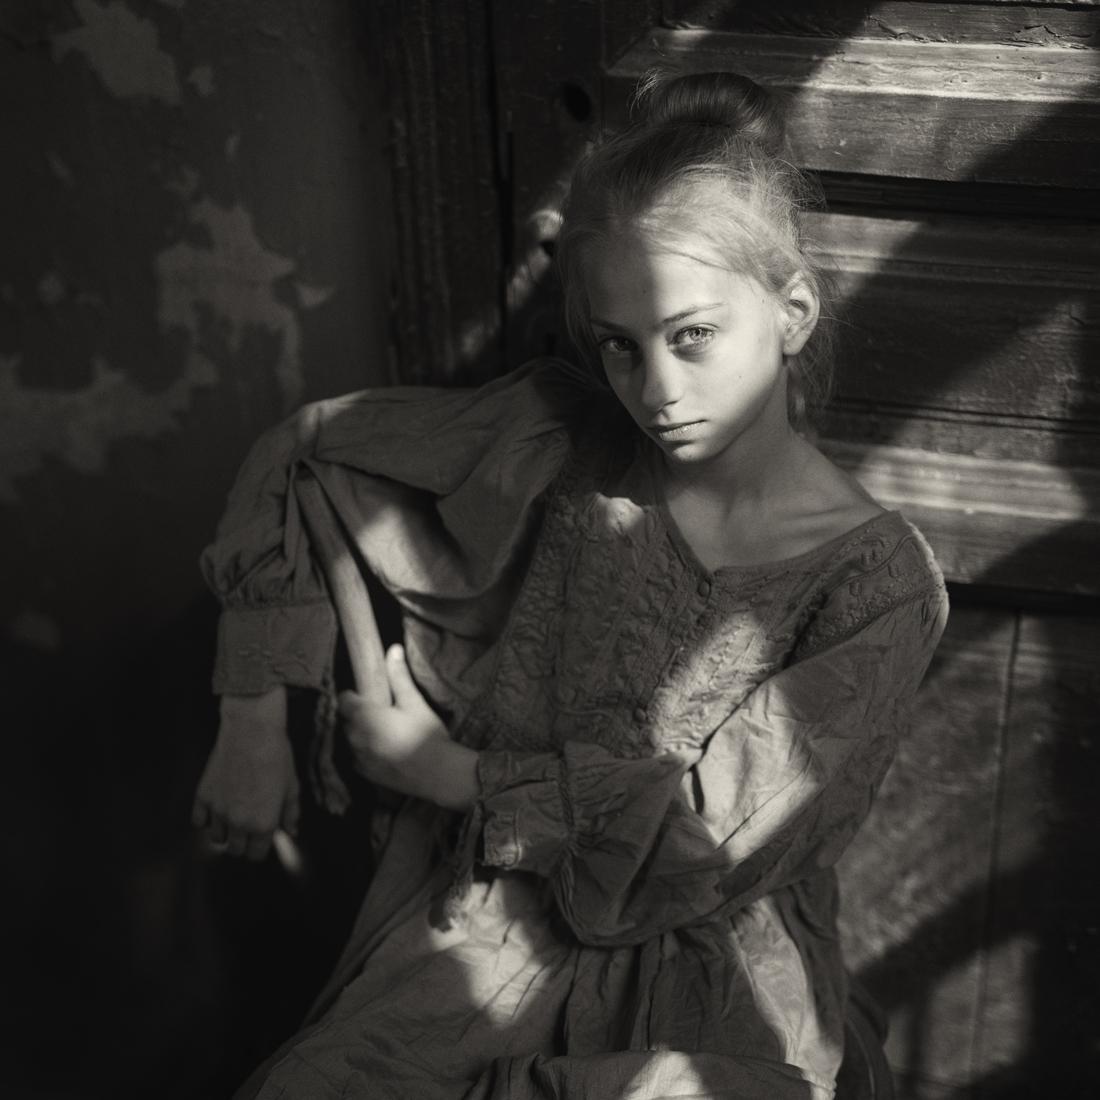 Evgeny Matveev - Portraits of young women